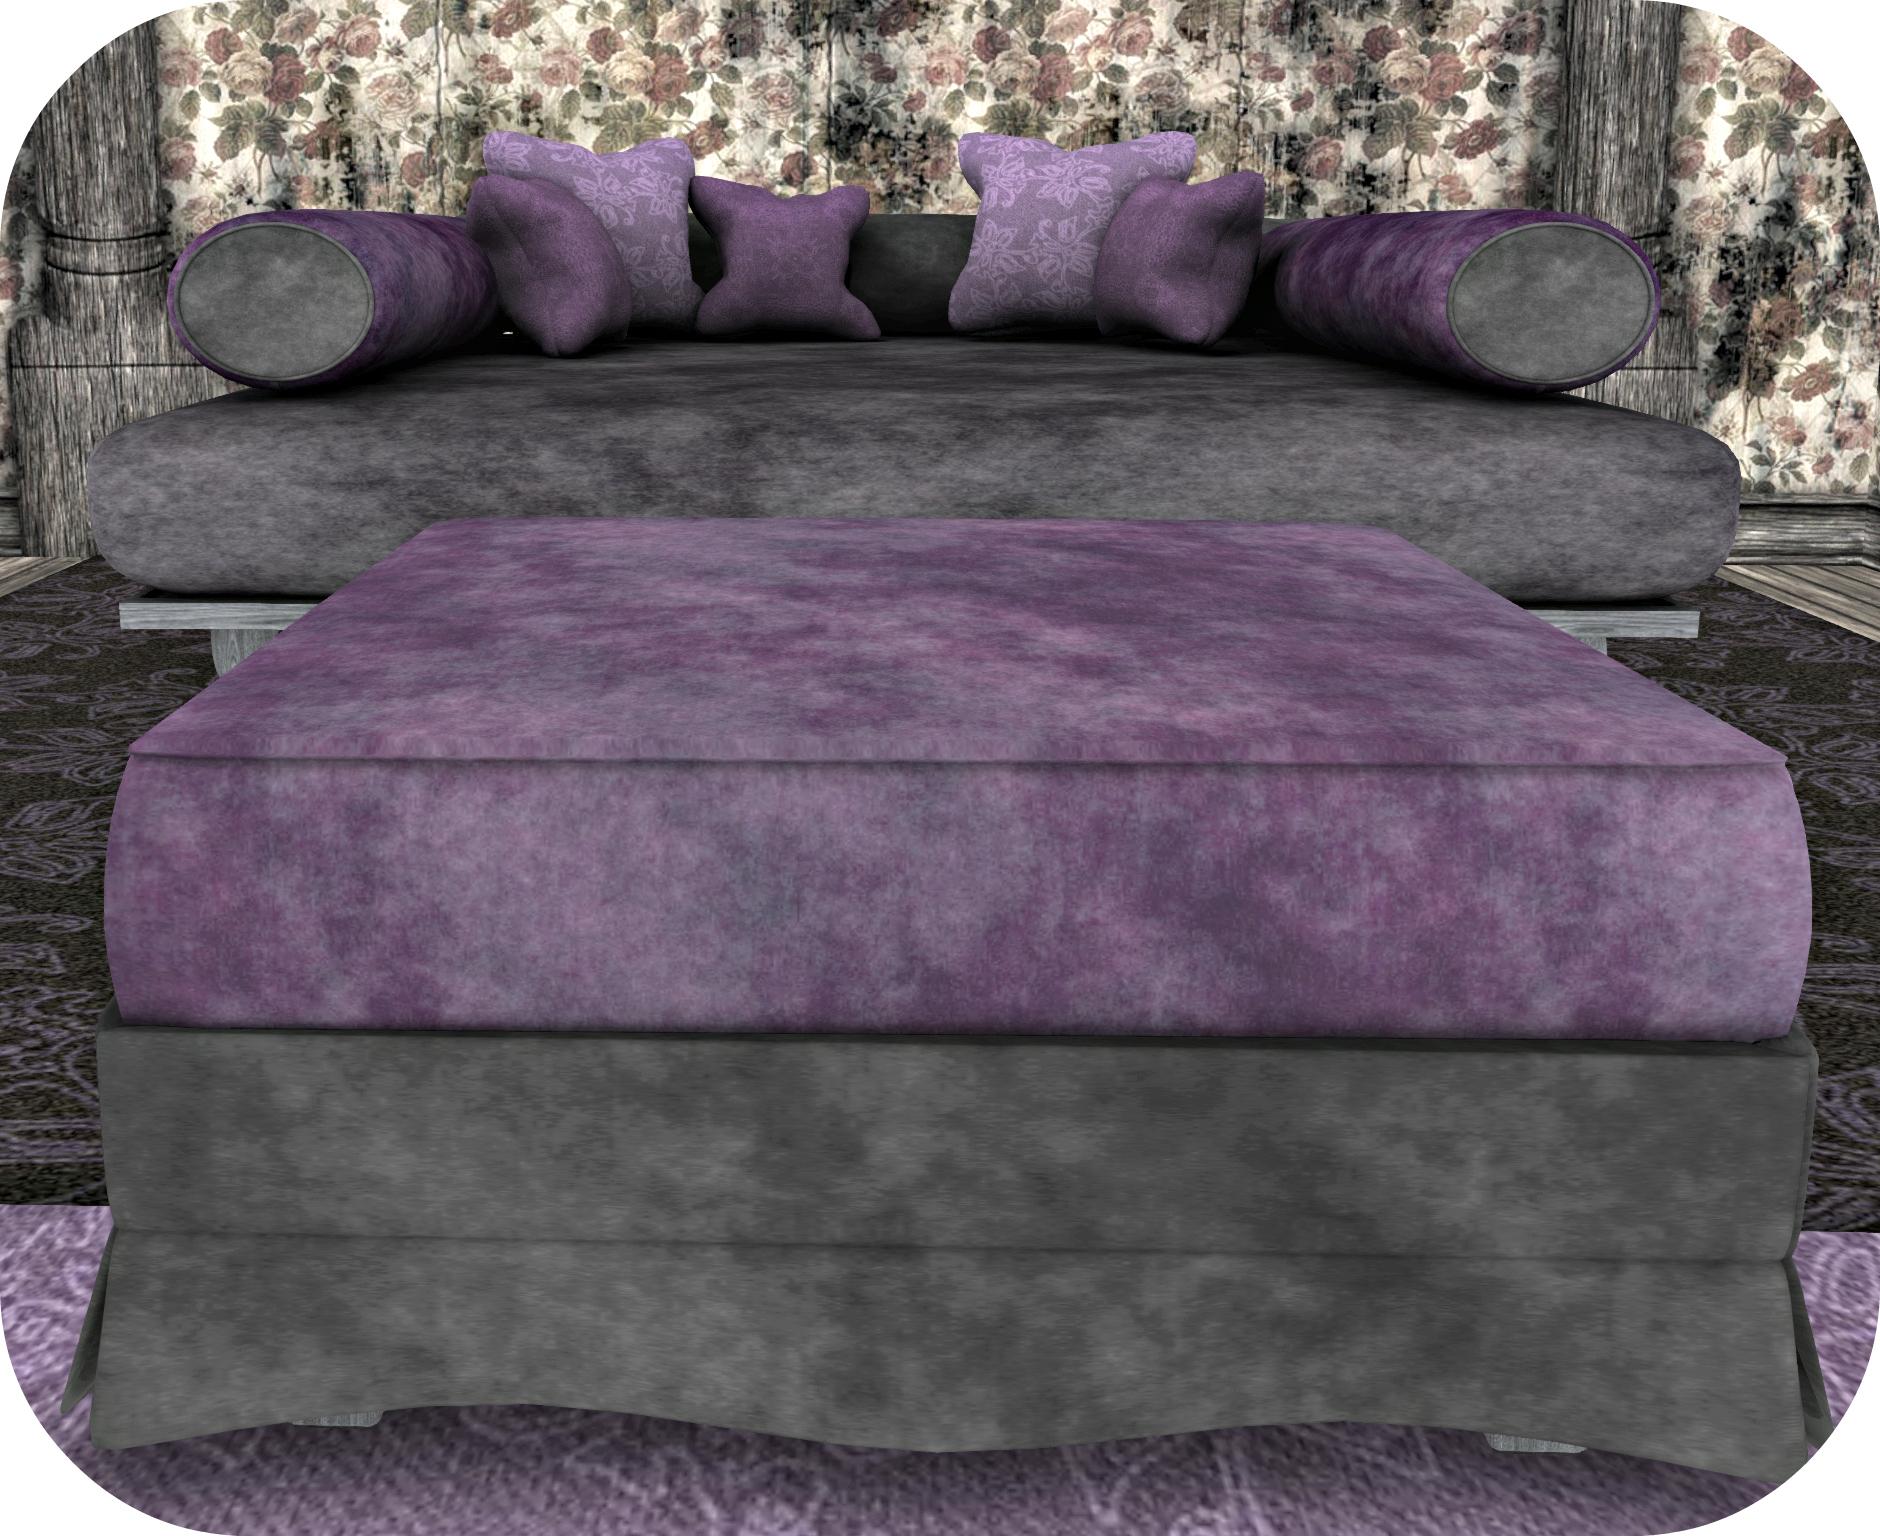 circa-sofa-ottoman-and-rugs_cropped